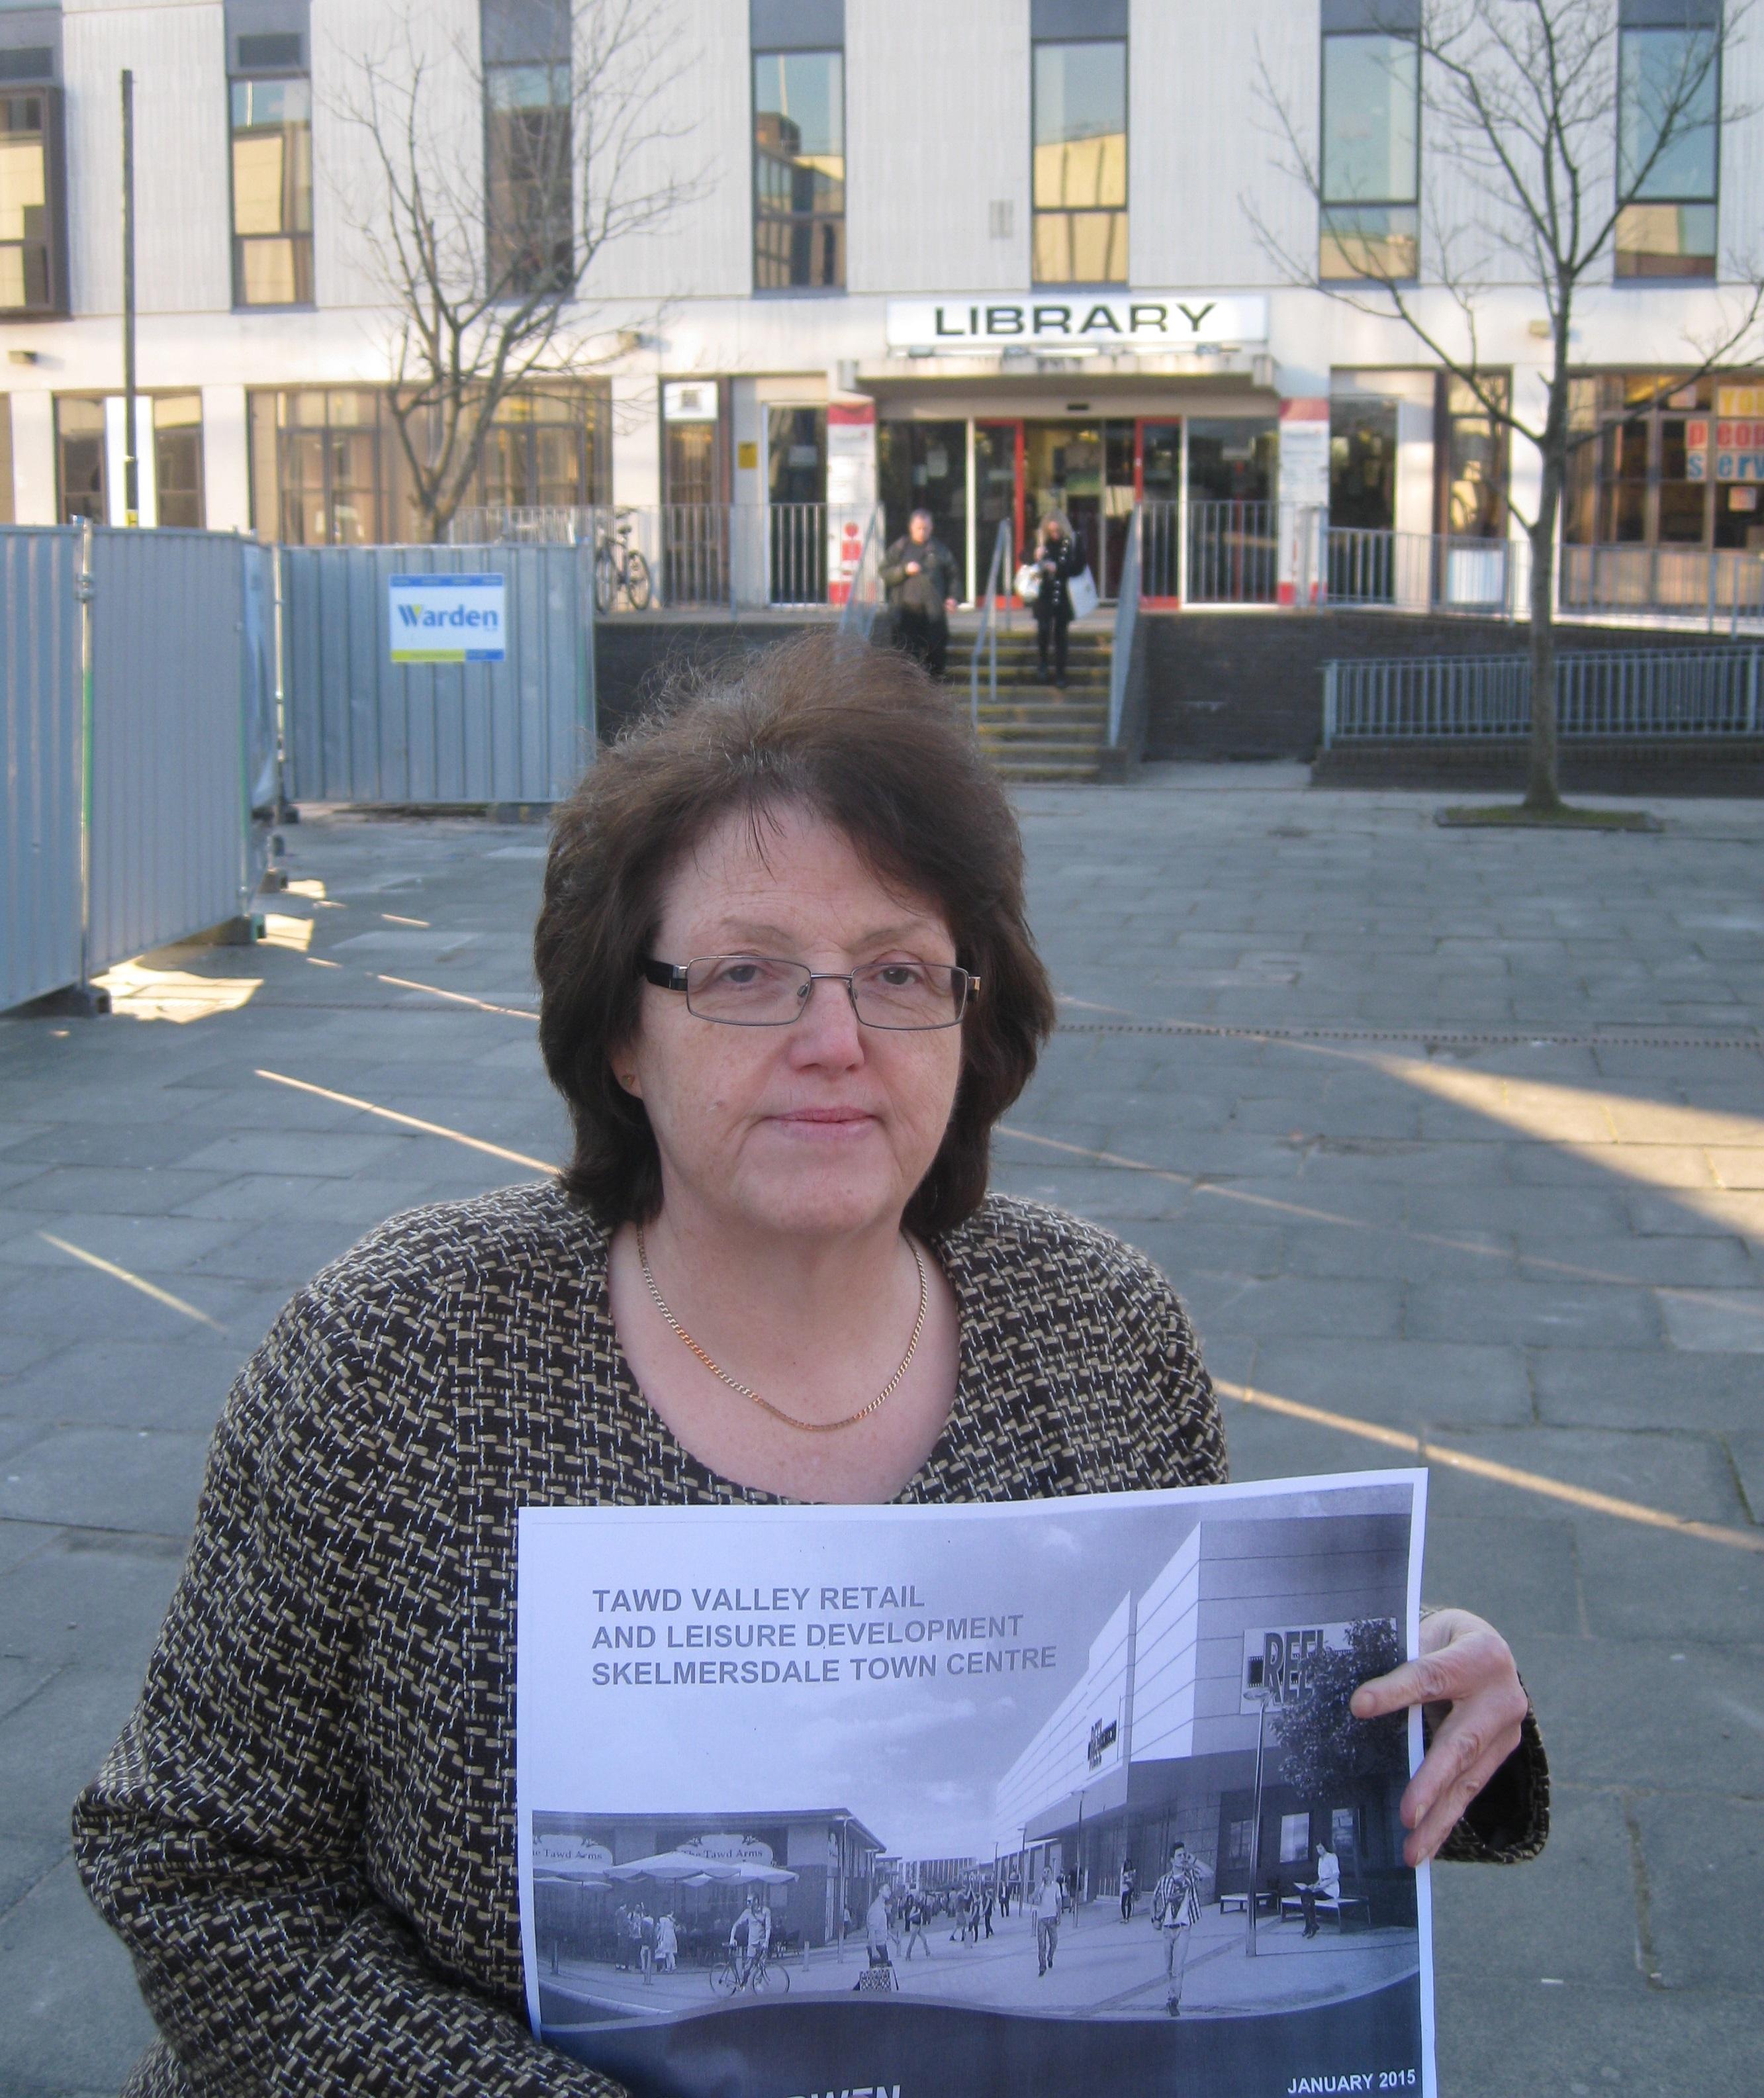 Rosie_Cooper_MP_Skelmersdale_town_centre_Town_Centre.jpg